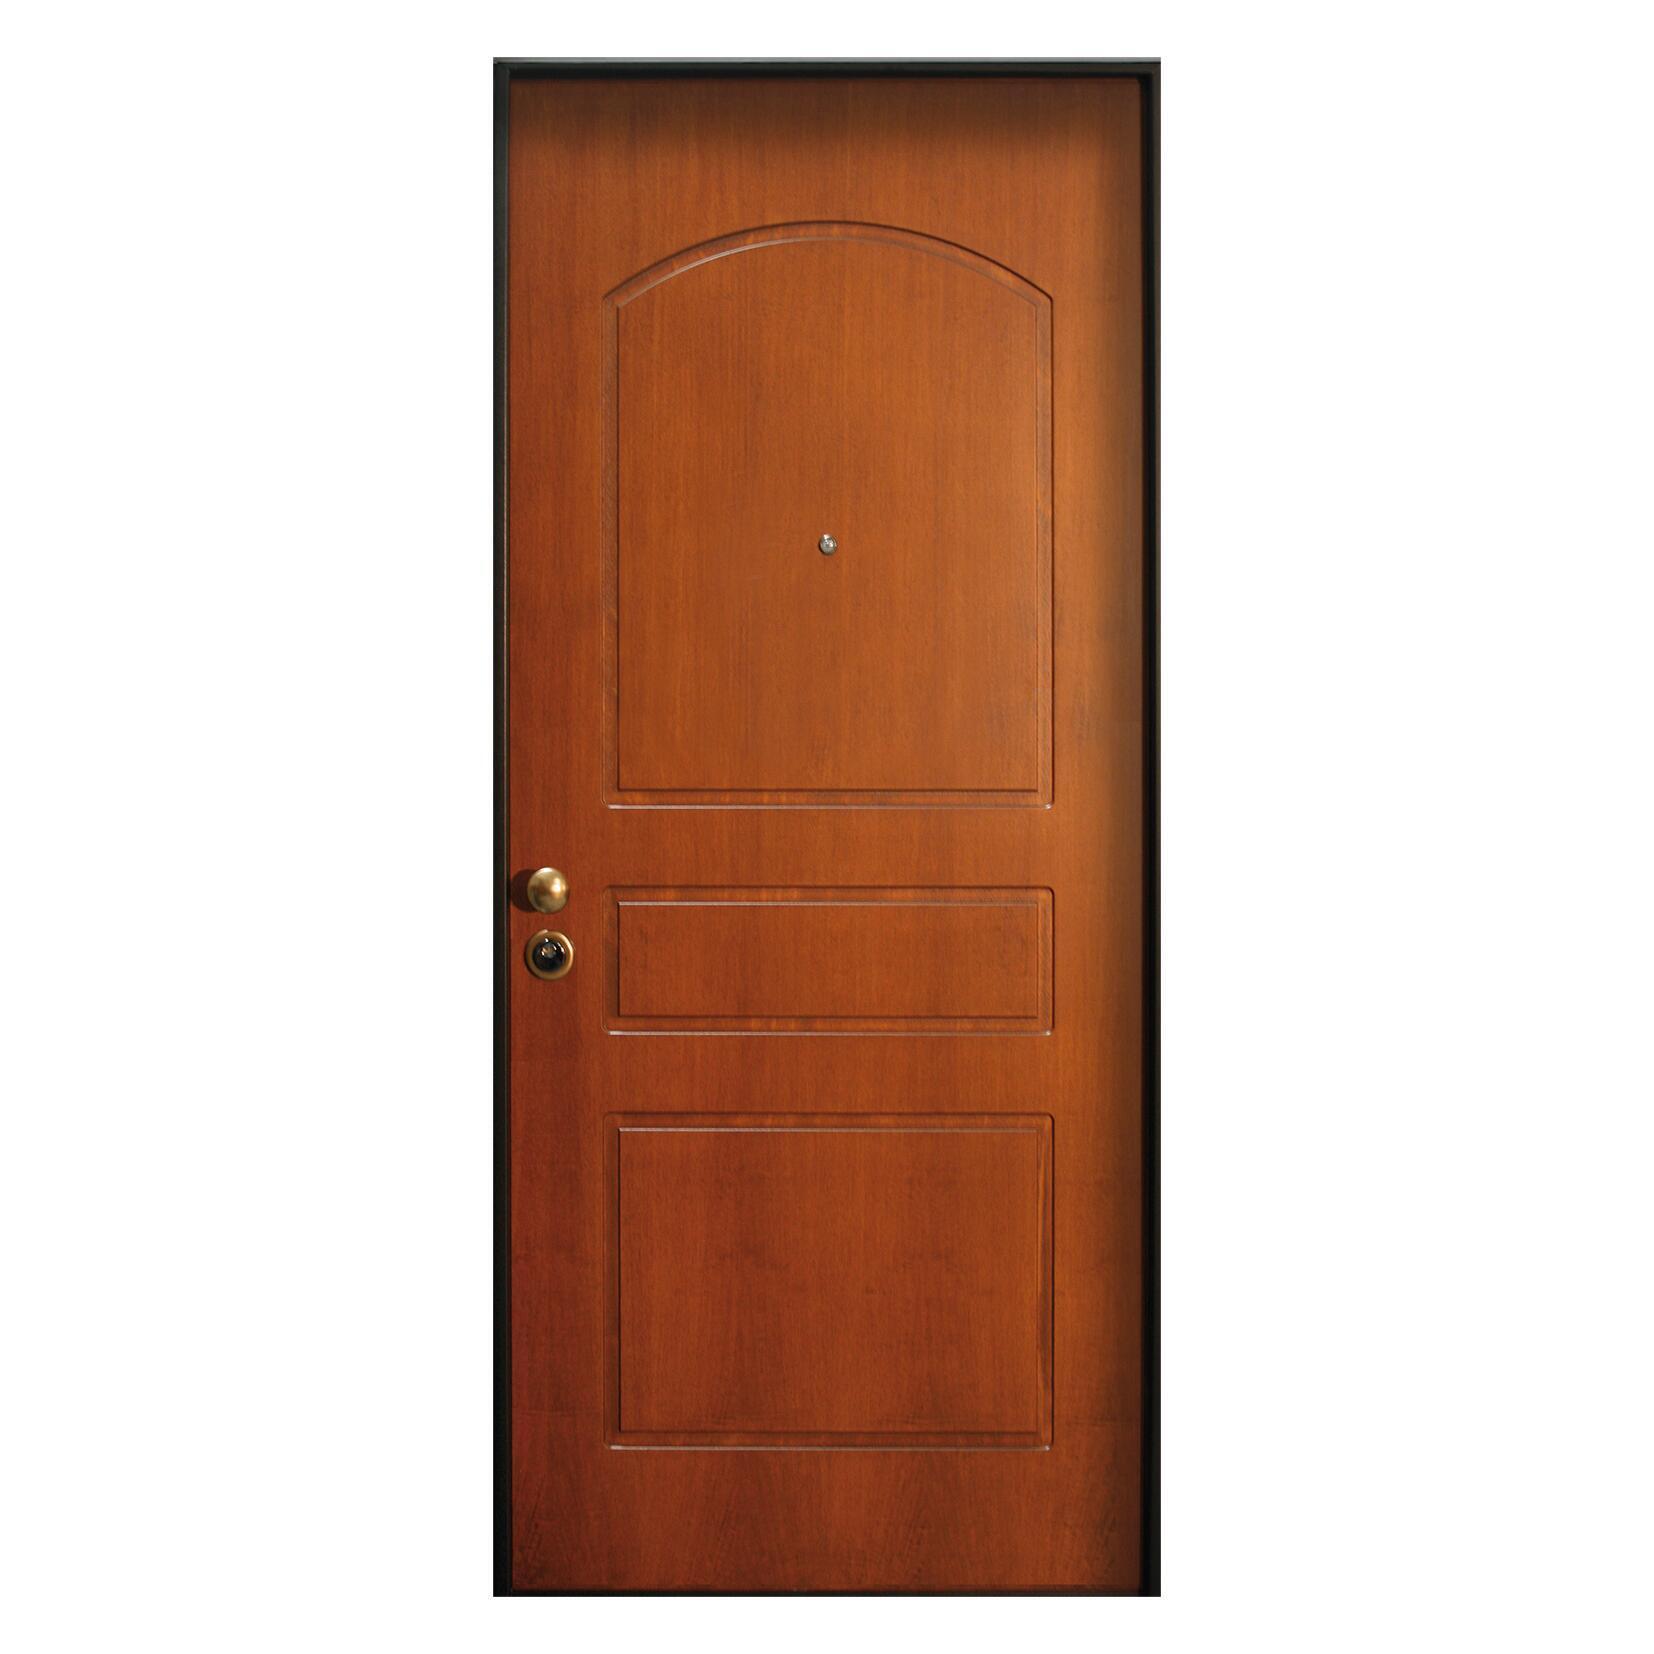 Porta blindata Better noce L 80 x H 210 cm destra - 1